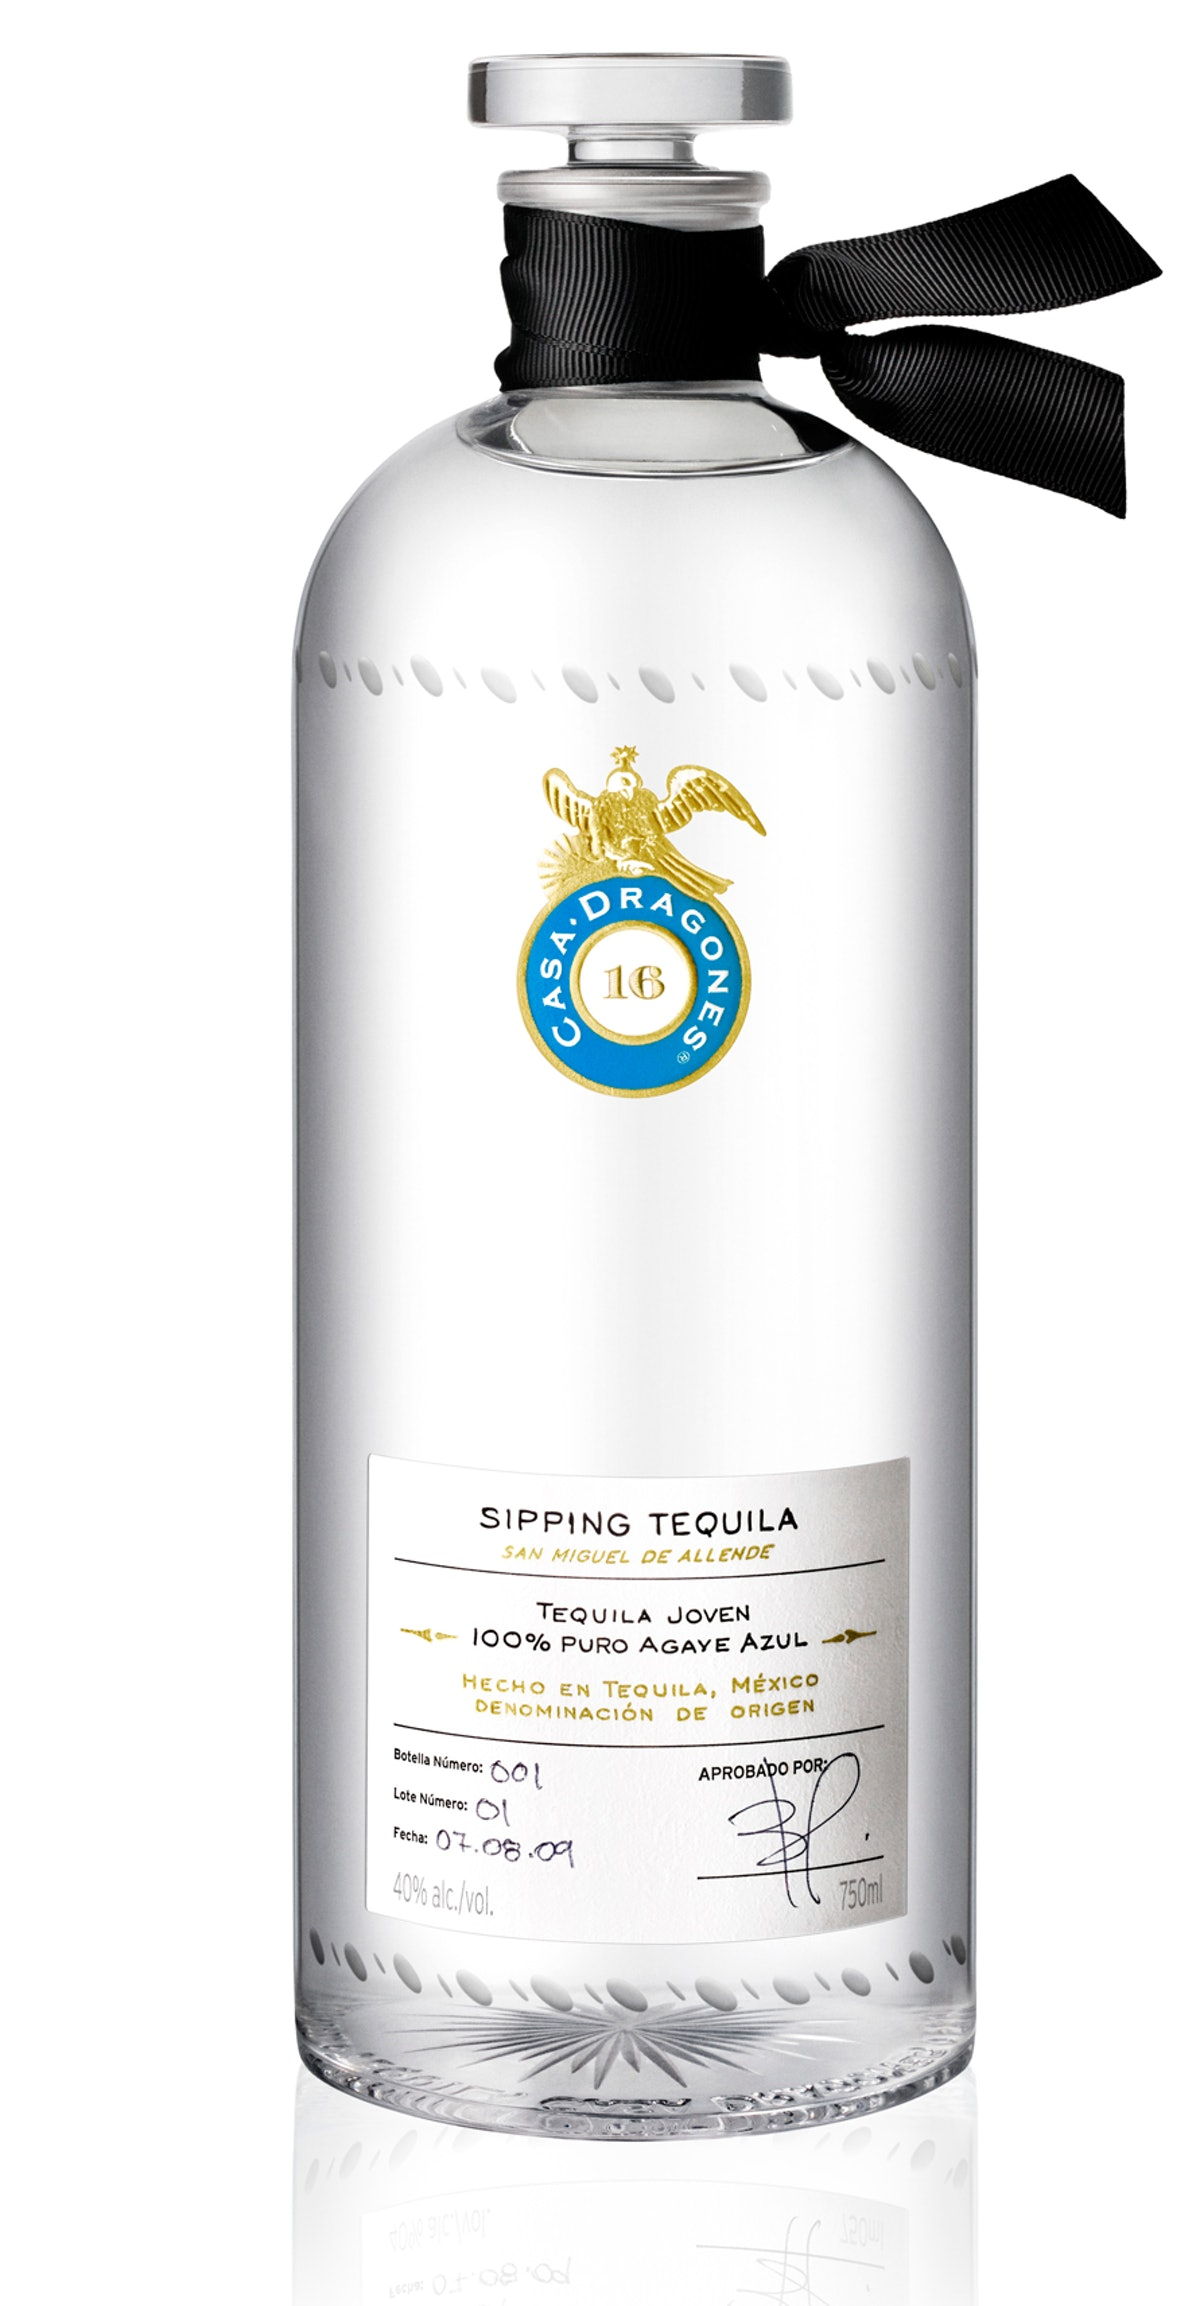 Casa Dragones limited edition tequila, $275, casa-dragones.com.